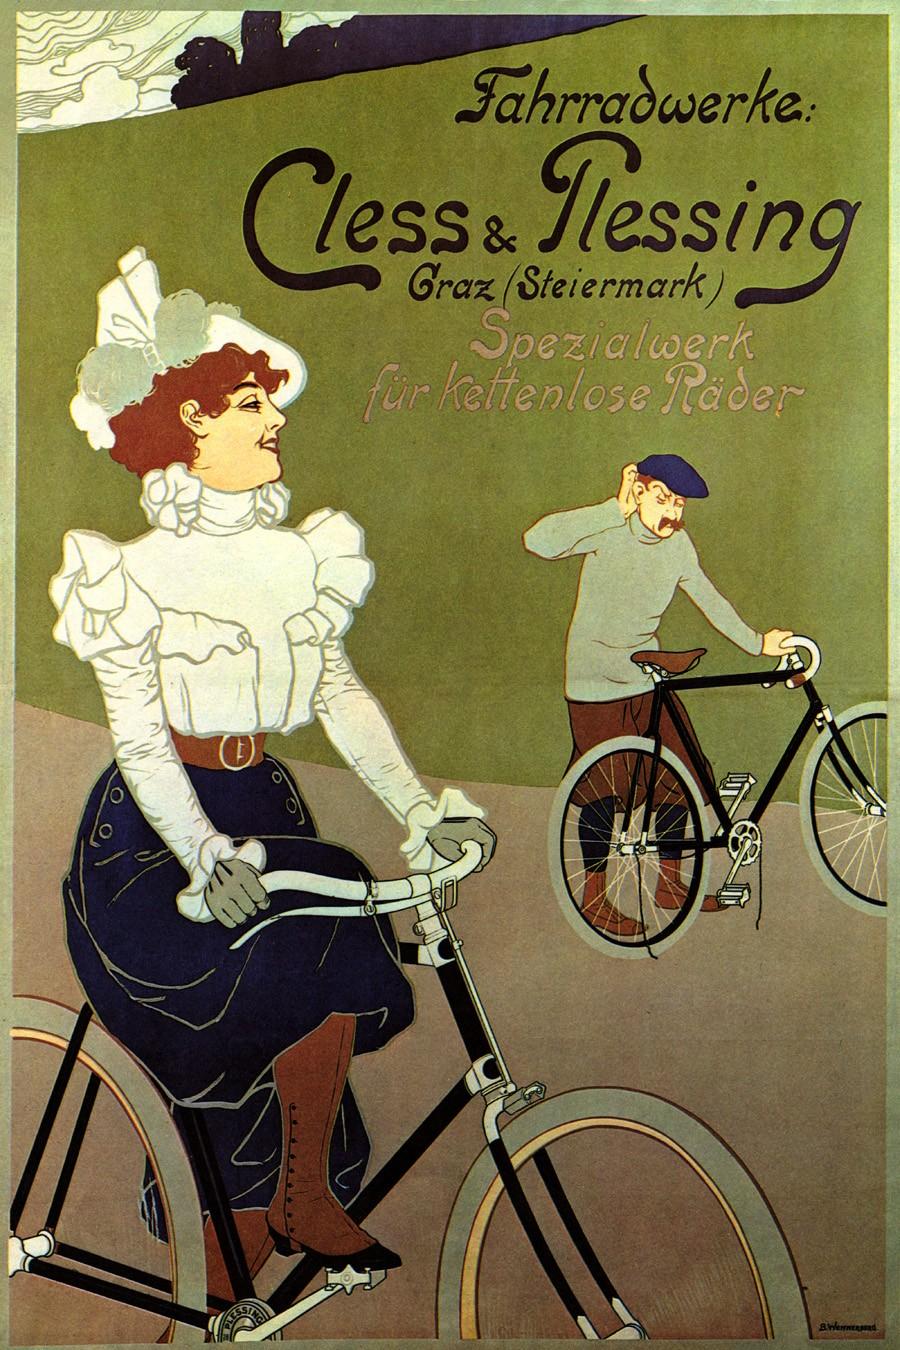 Foto 1 - Cless Plessing Casal AndandoBicicletaVintage Cartaz Poster em Papel Matte